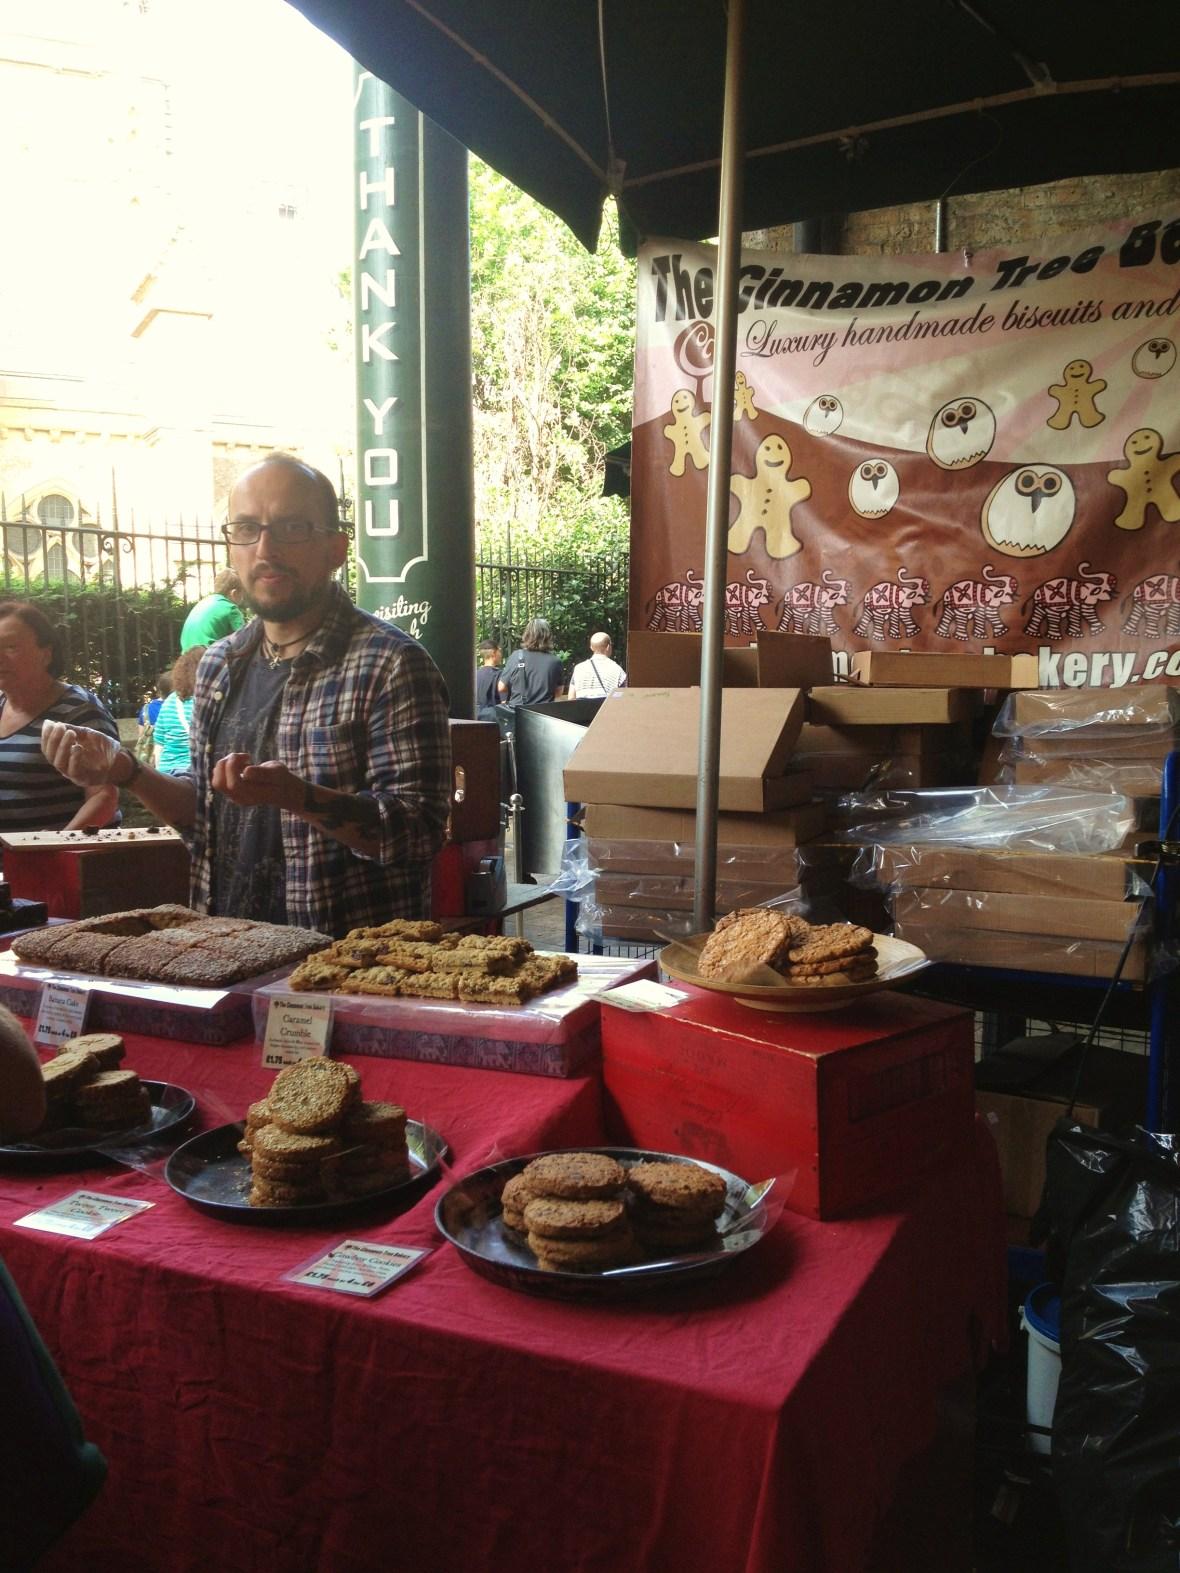 MoMo & Coco's Guide to London's Borough Market Desserts - Cinnamon Tree Bakery